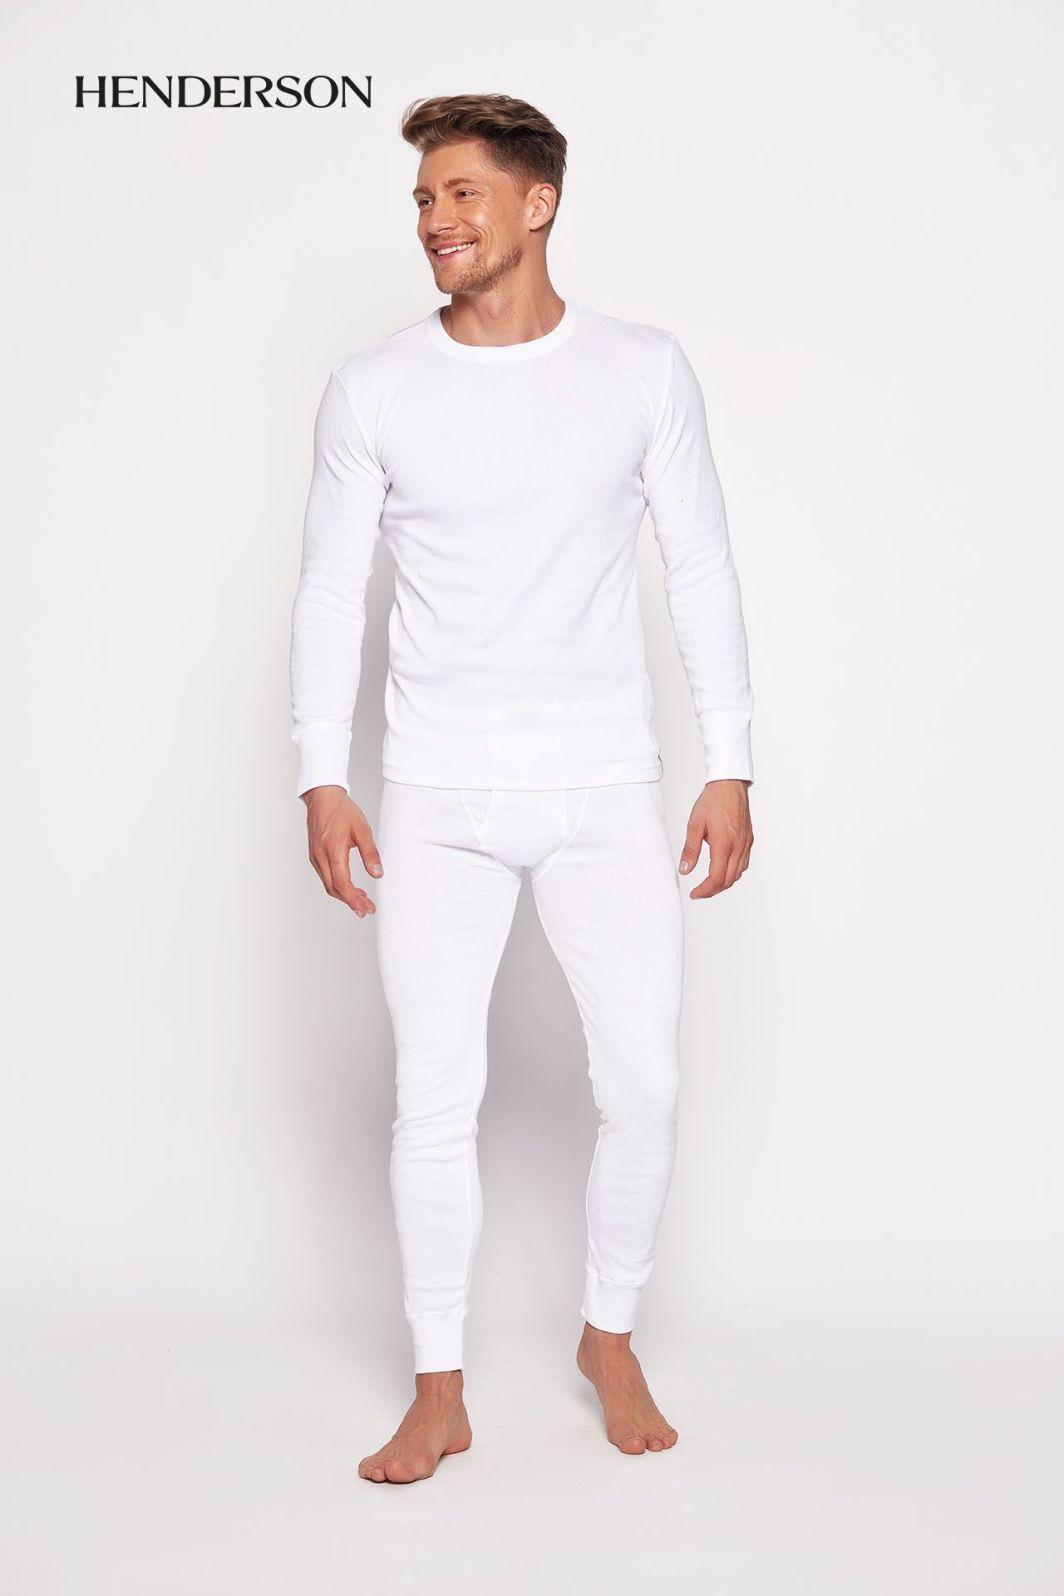 Esotiq & henderson Kalesony 4862 białe r. L 1